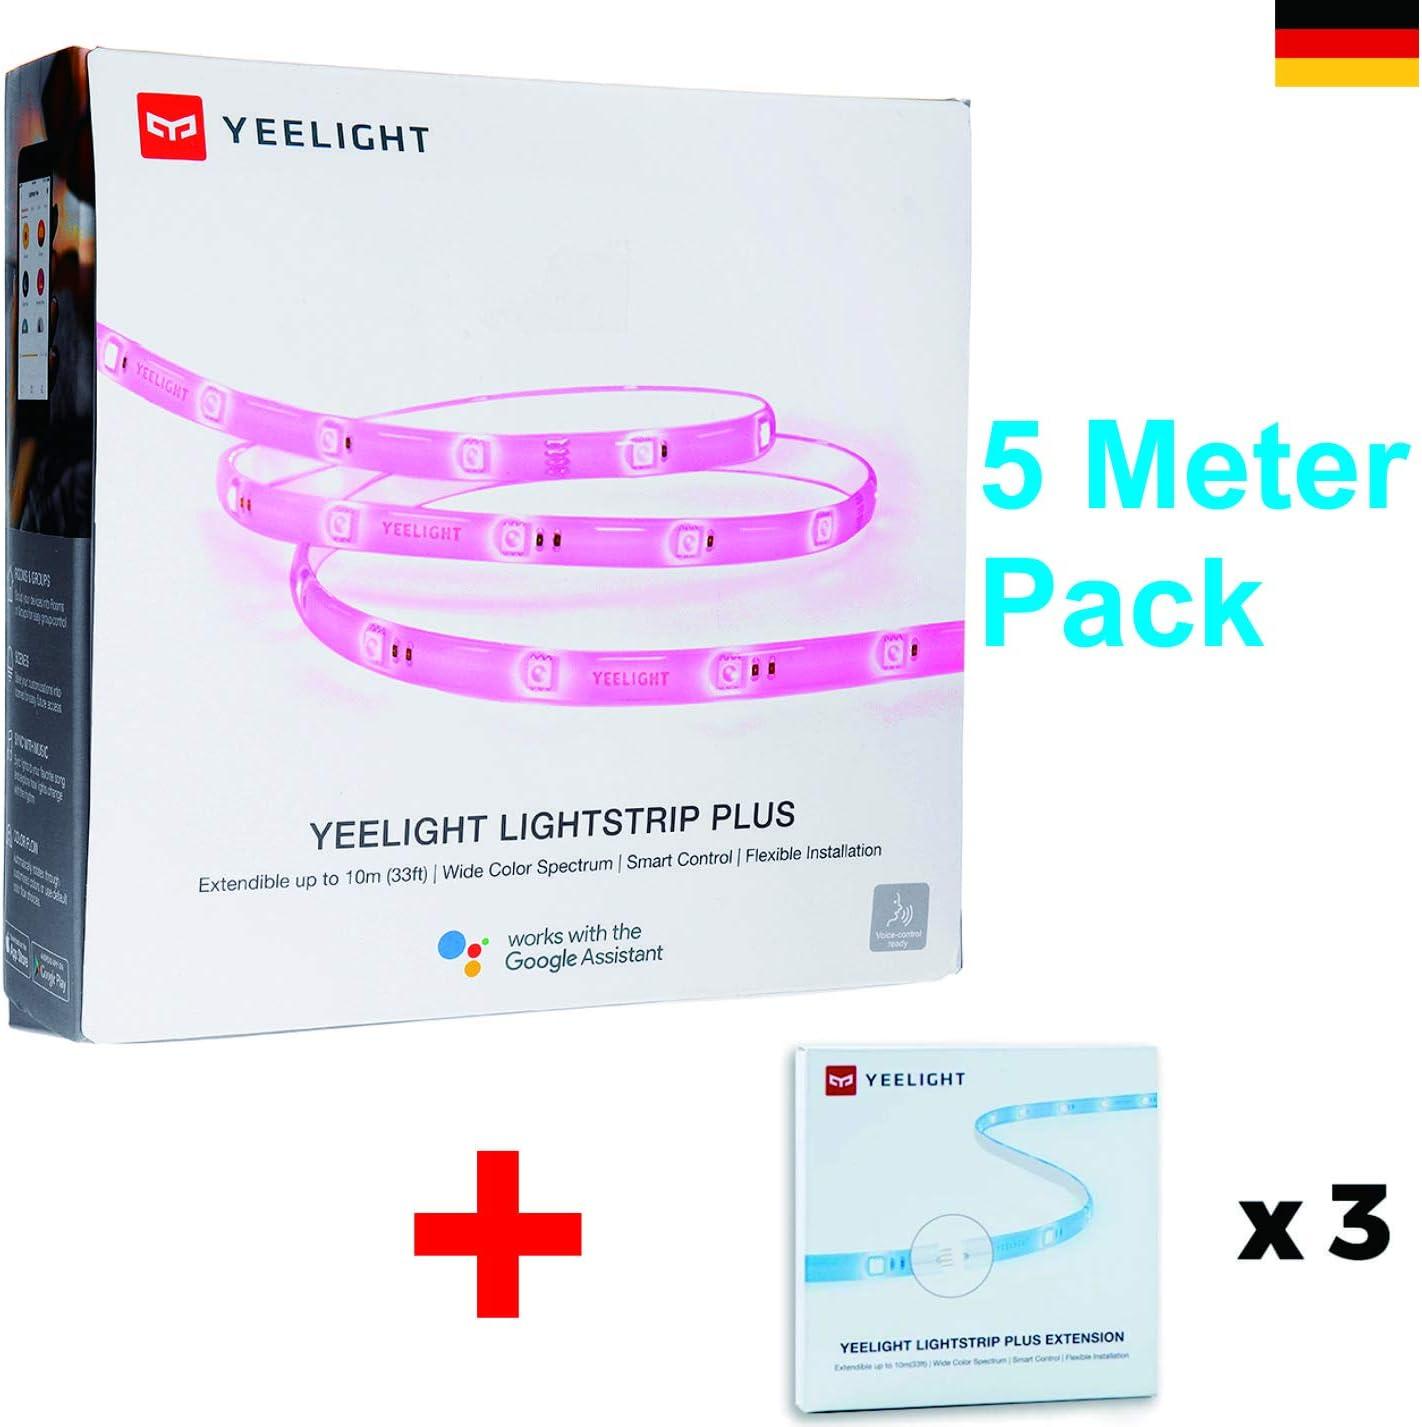 Yeelight Lot de 5 guirlandes Lumineuses avec rallonge jusqu/à 10 m WiFi RVB